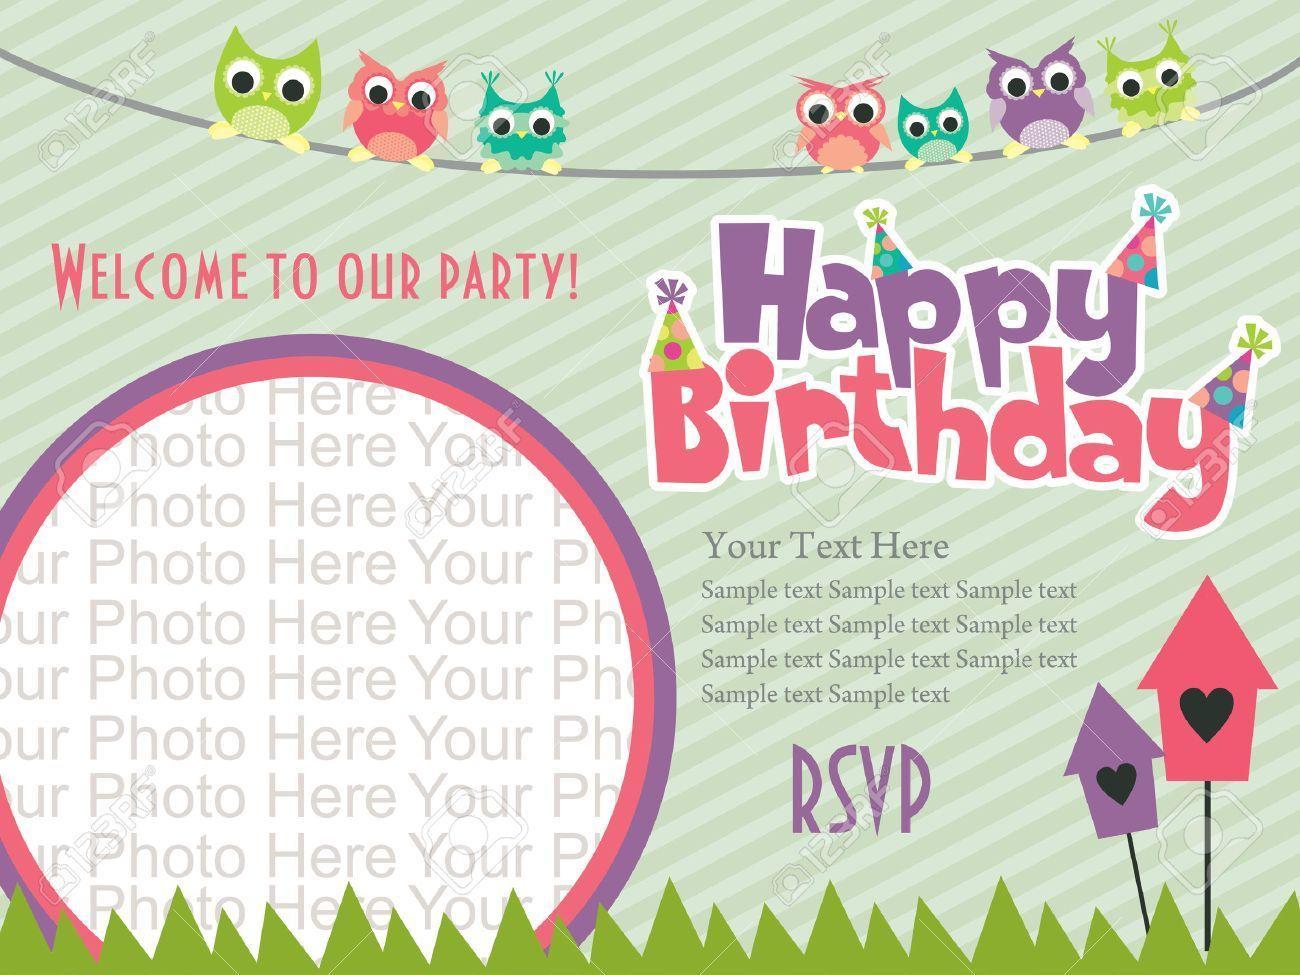 Happy Birthday Invitation Card Design Vector Illustration Royalty For Birthday Invitations Kids Birthday Invitation Card Template Invitation Card Birthday